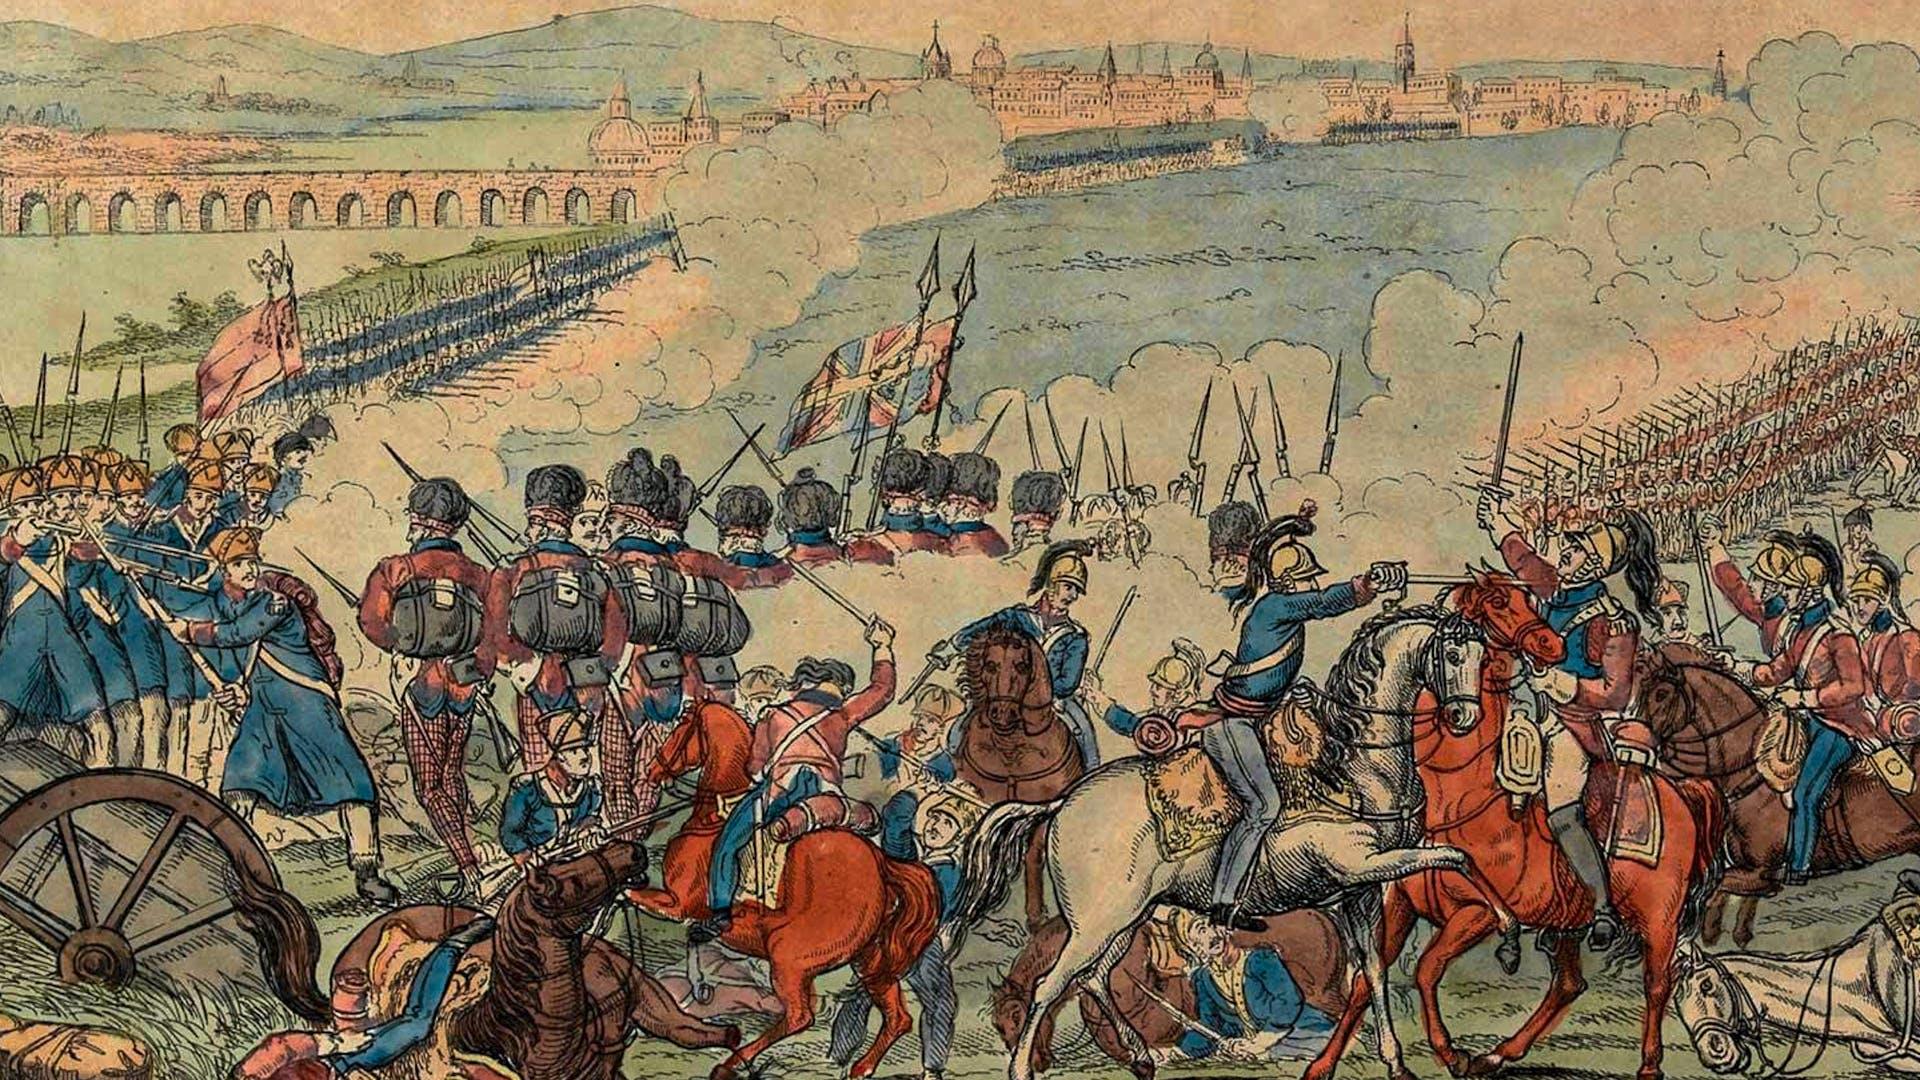 2500 144 TAB SCOY 1812 Battle 0f Salamanca 01 2x